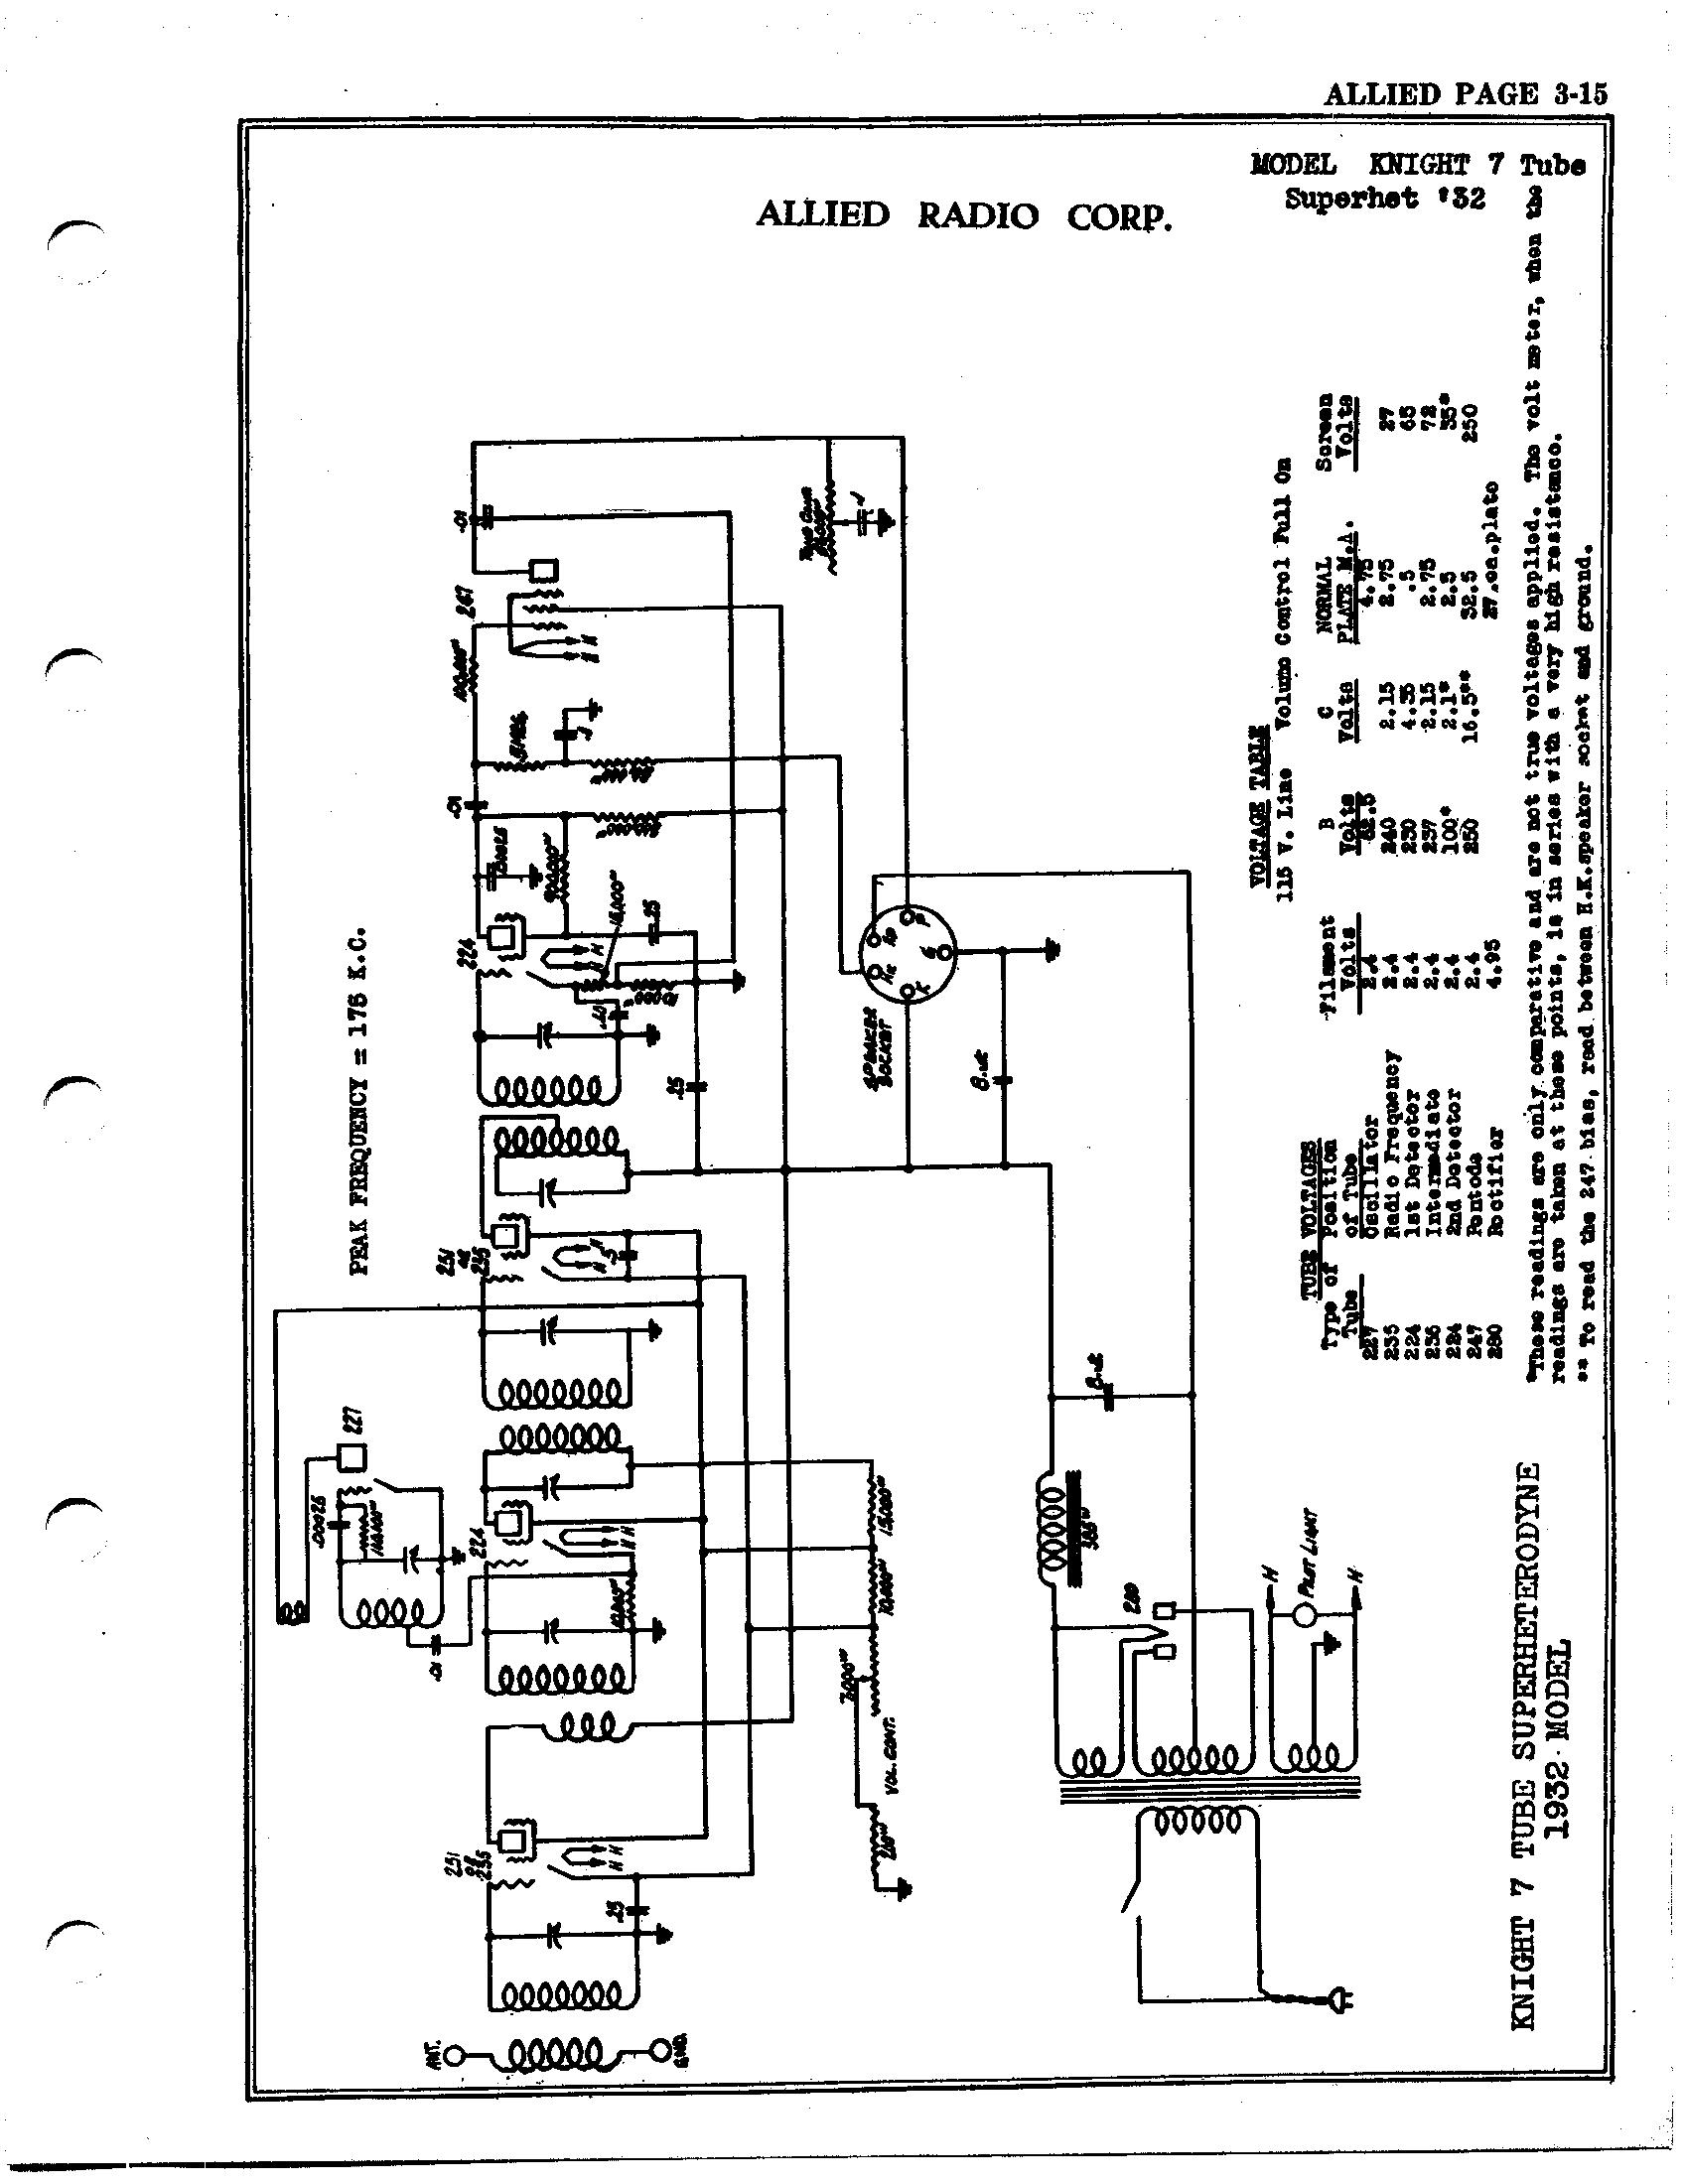 Allied Radio Corp 7 Tube Super 32